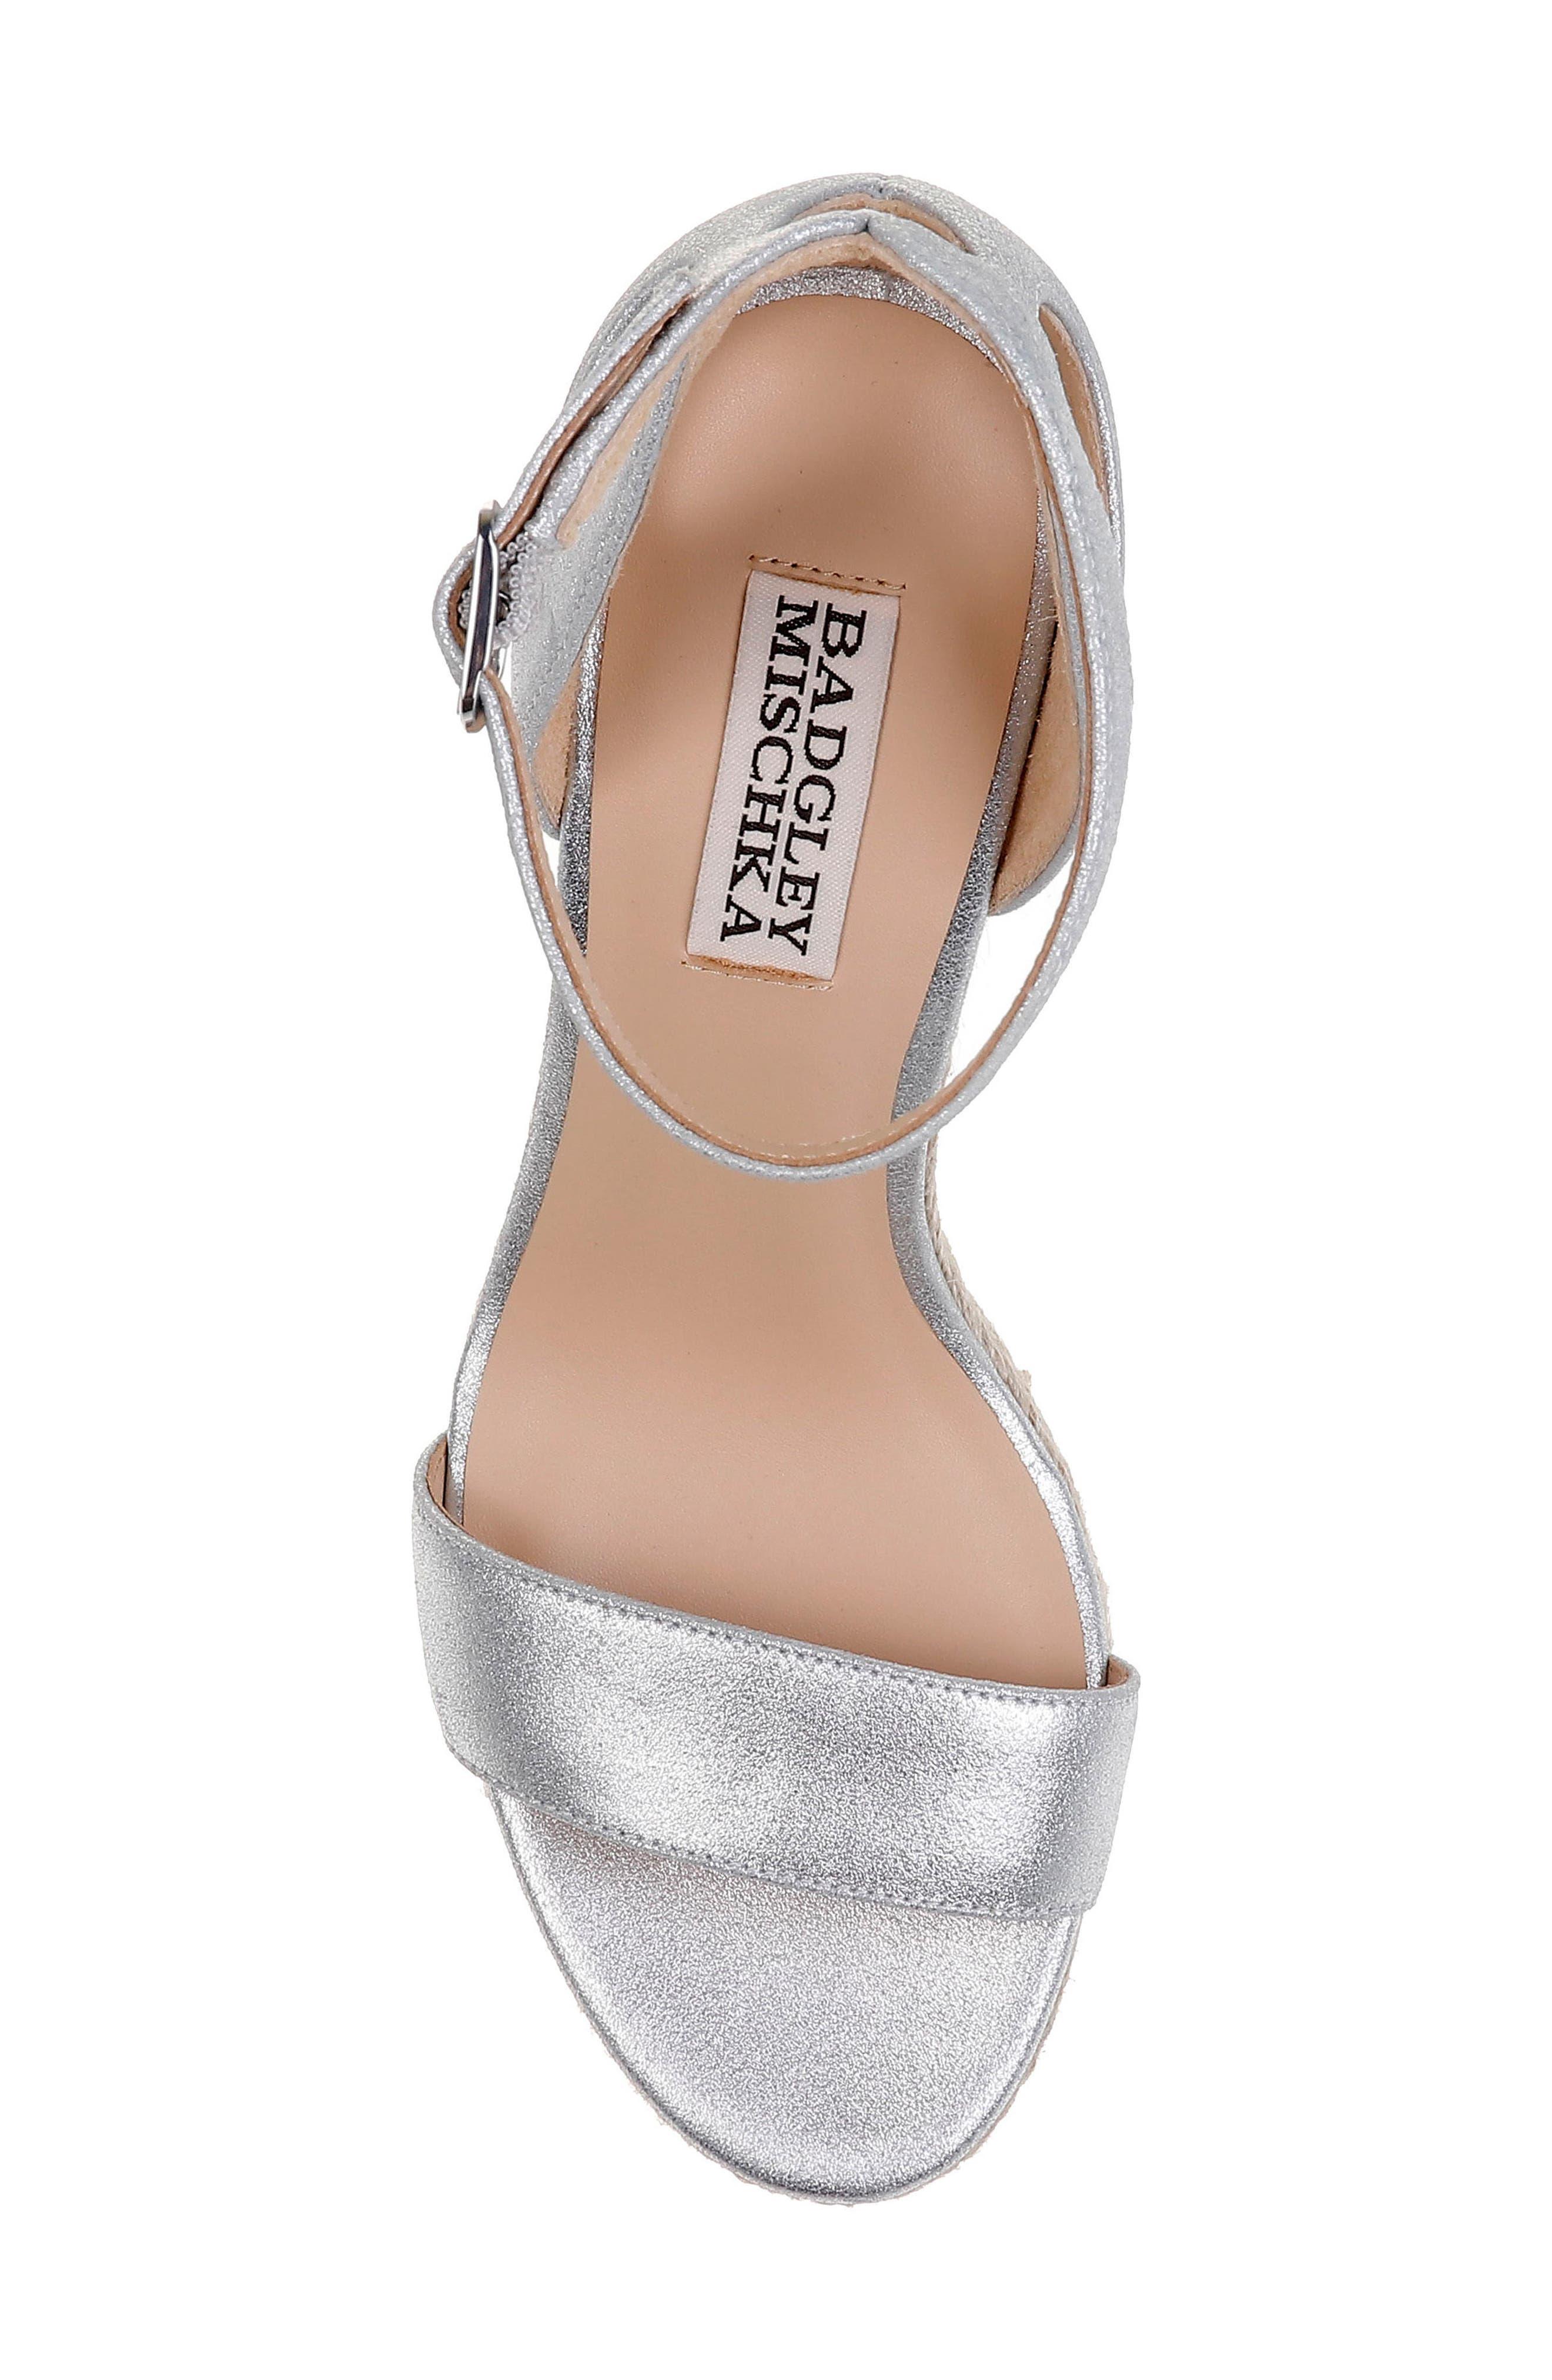 Honest Espadrille Wedge Sandal,                             Alternate thumbnail 5, color,                             Silver Metallic Suede